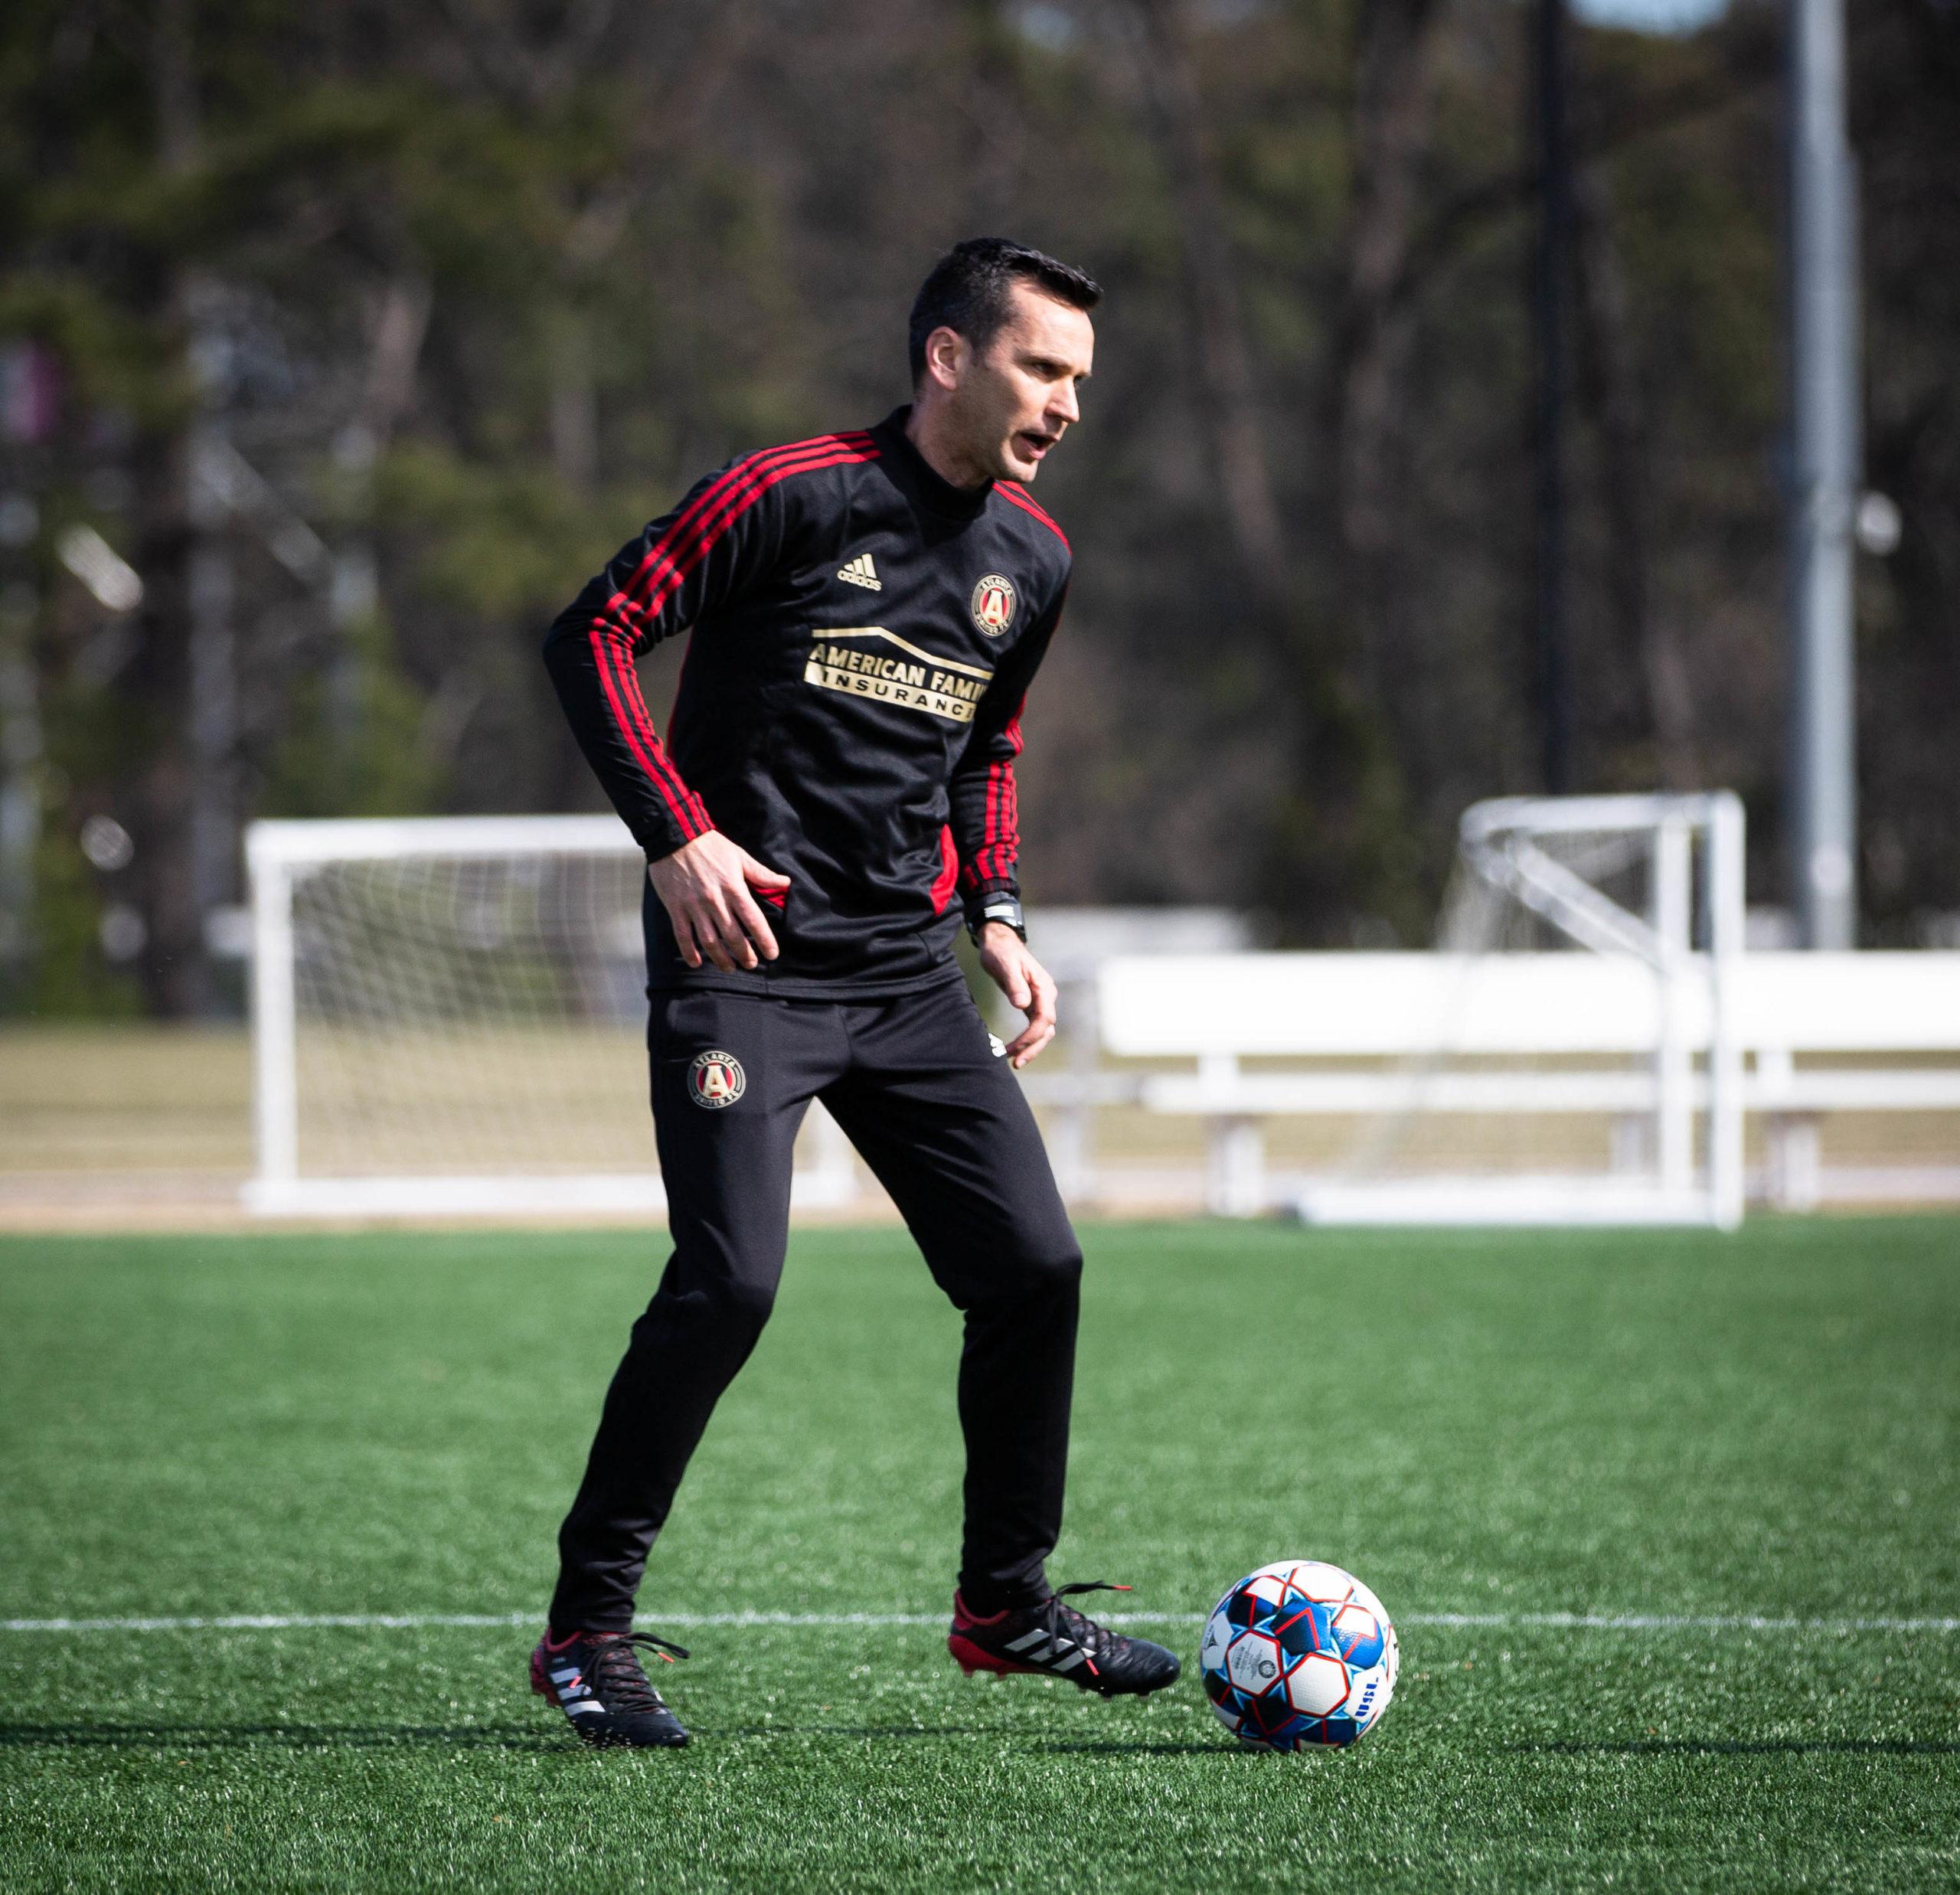 Stephen Glass takes training at Atlanta United. Pic courtesy of Atlanta United.